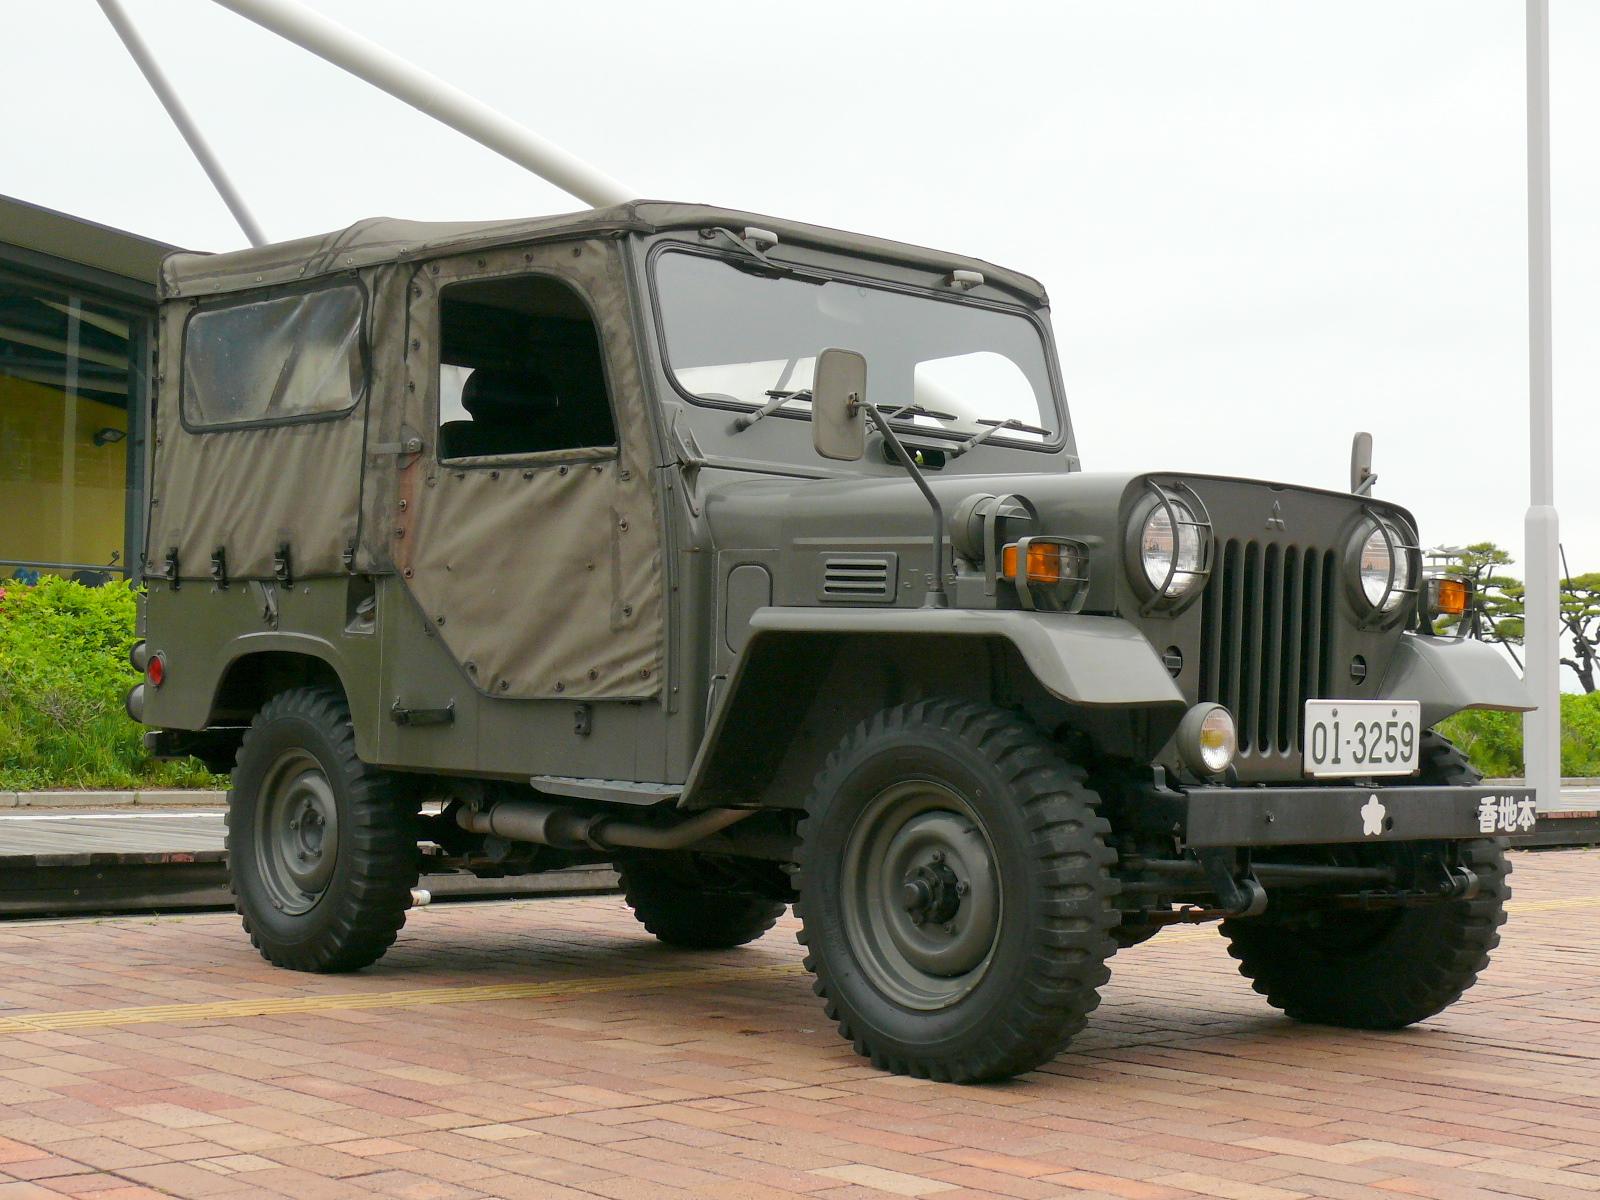 filejgsdf type 73 light truck 3259jpg